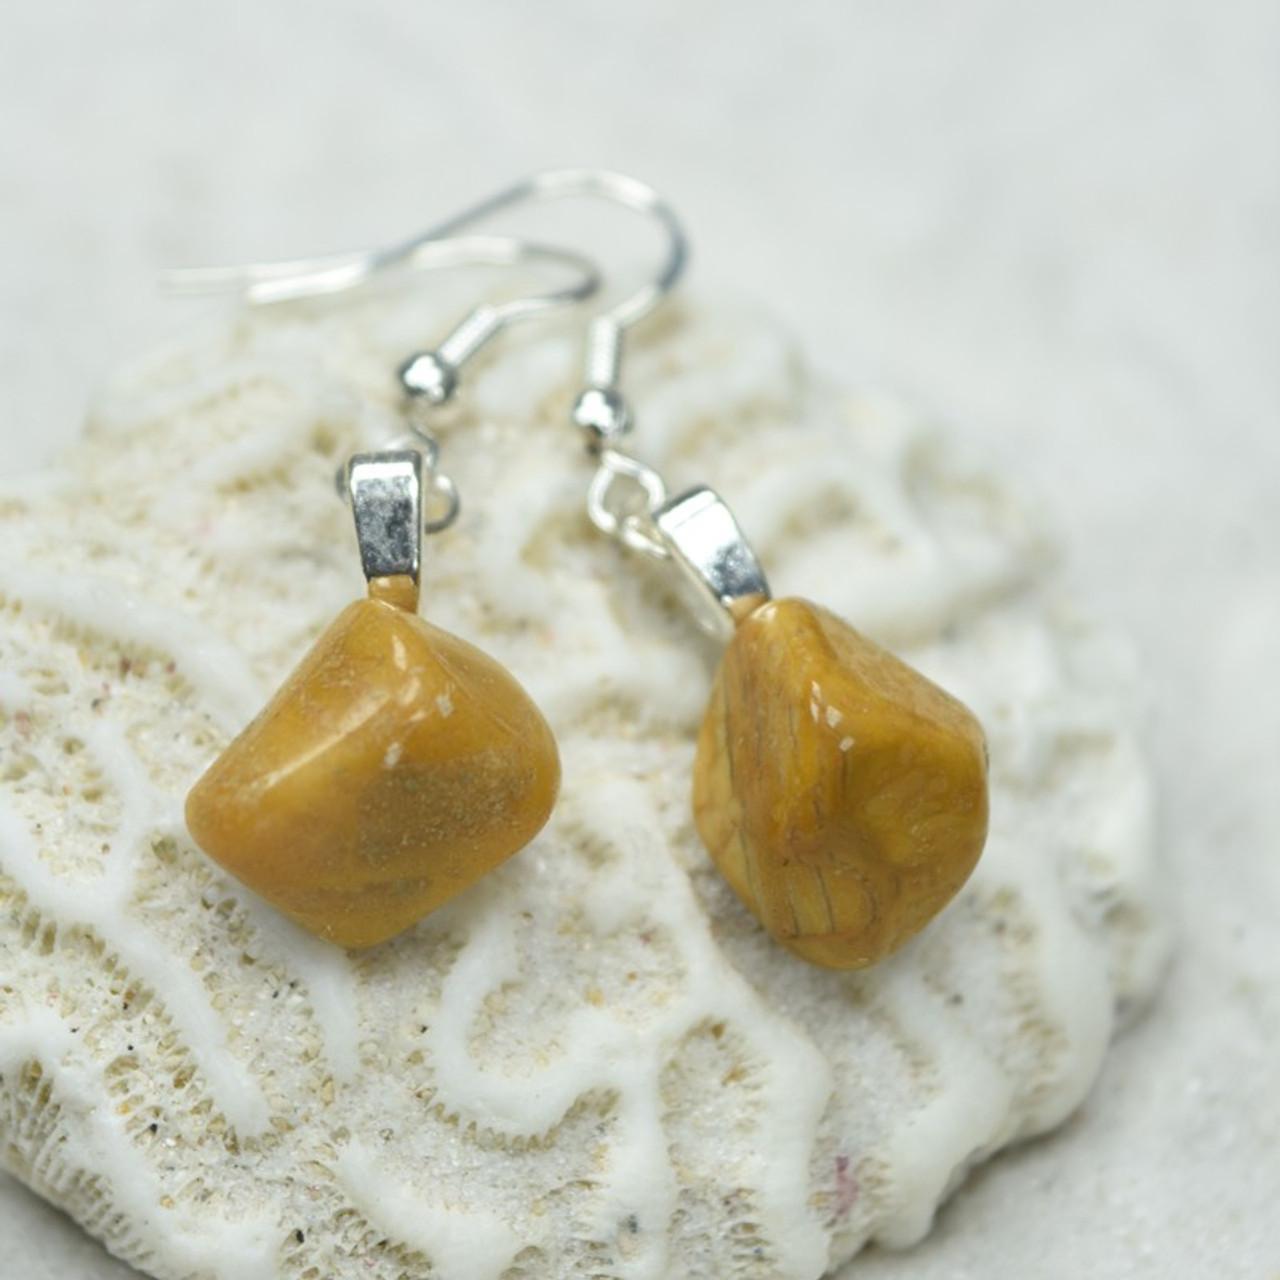 Tumbled Yellow Jasper Earrings